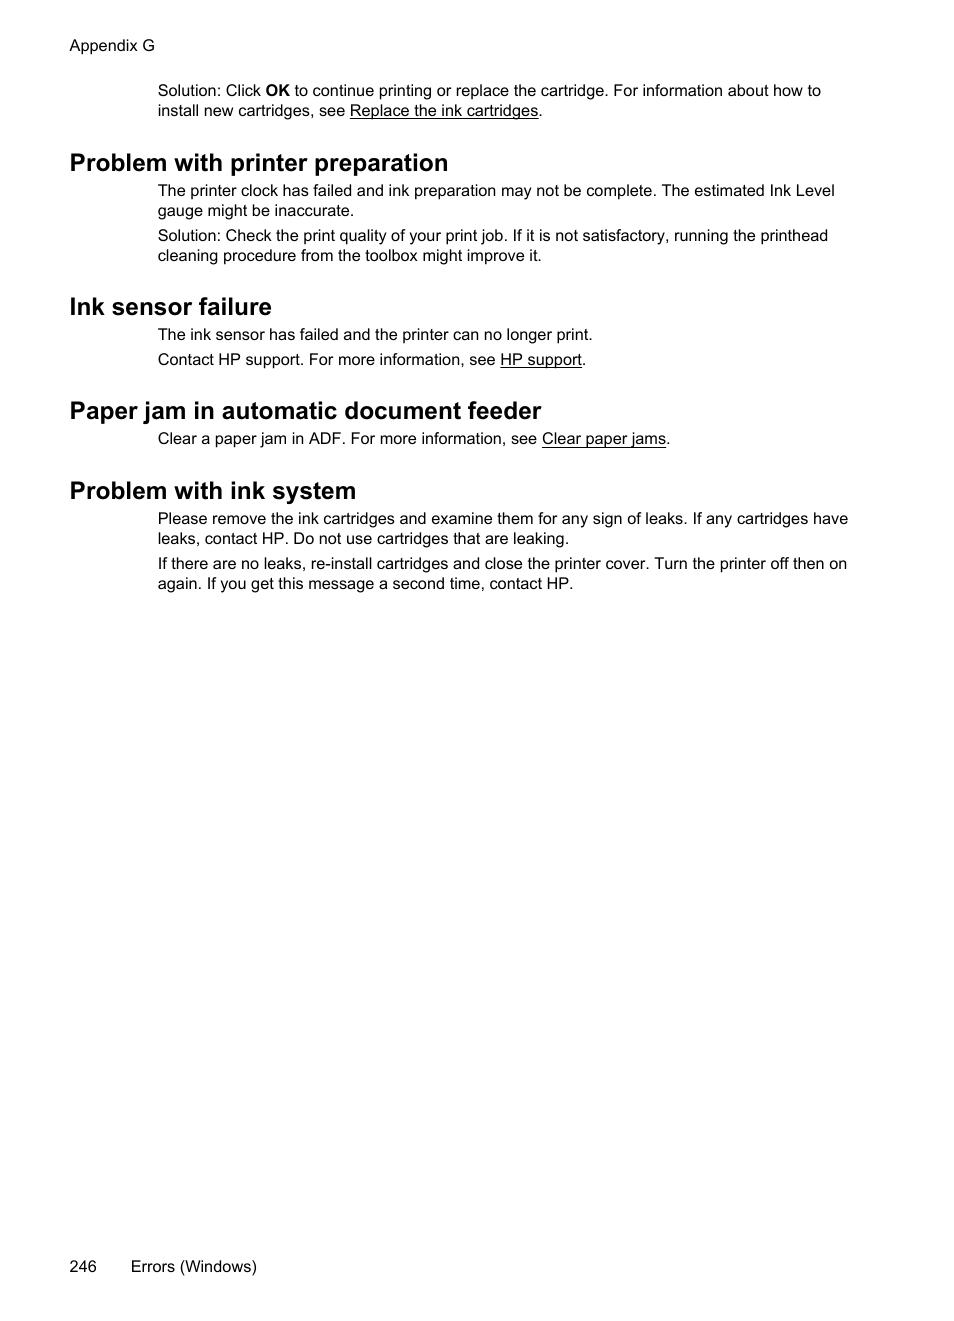 Problem with printer preparation, Ink sensor failure, Paper